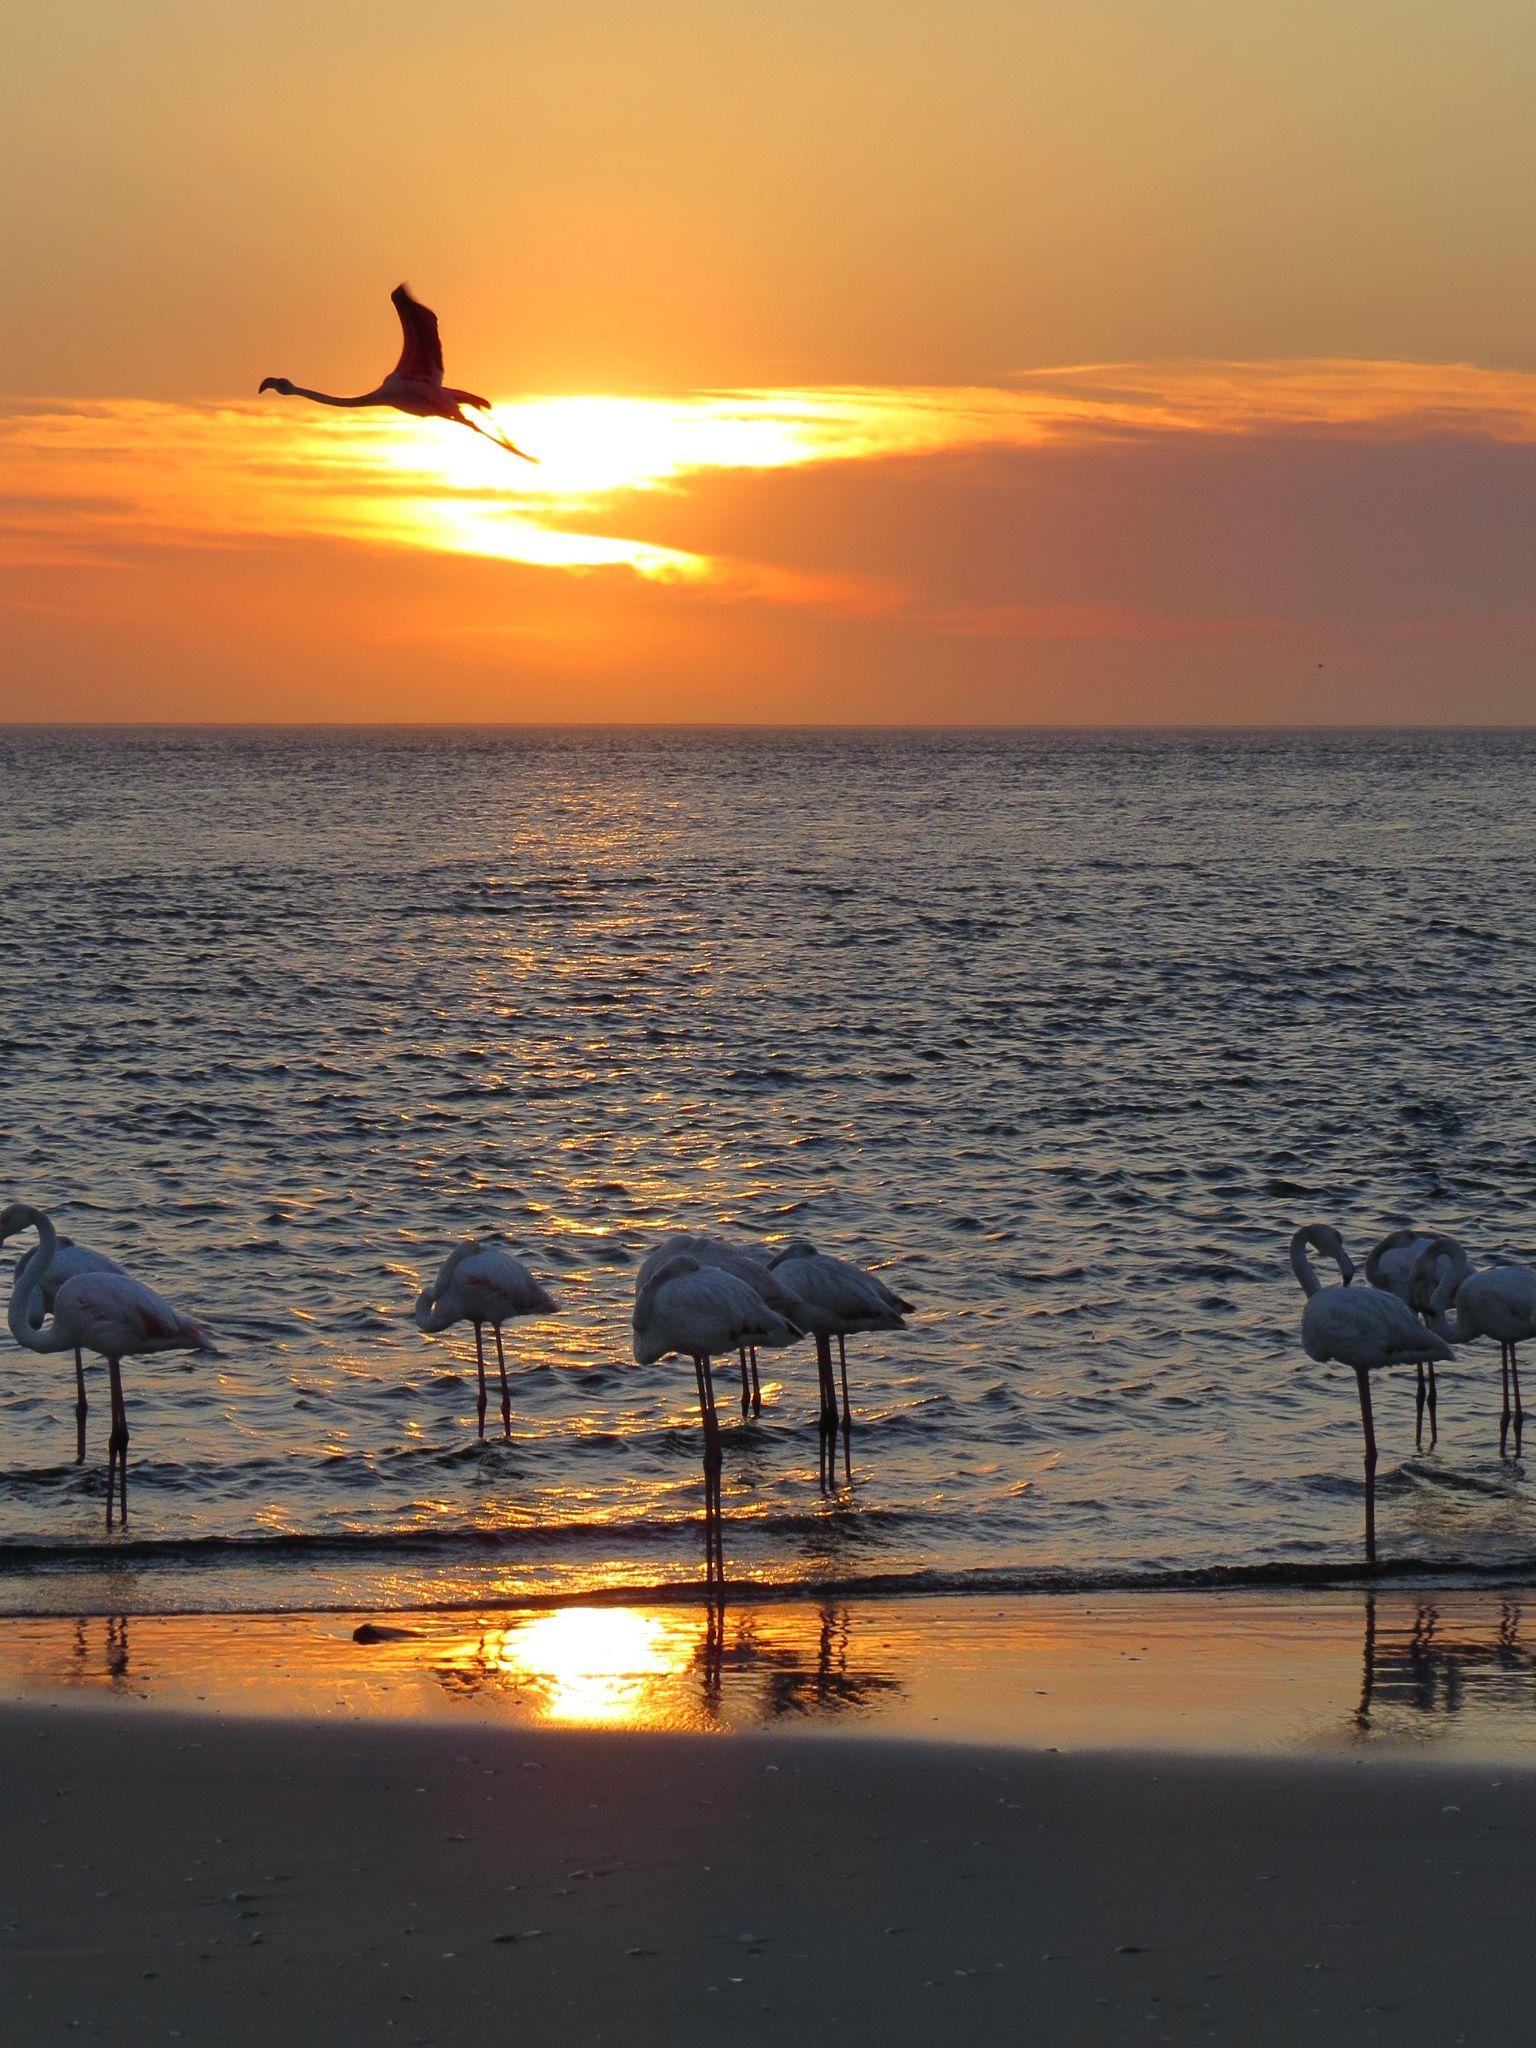 Flamingo's at Sunset by Jo-Ann de Smit